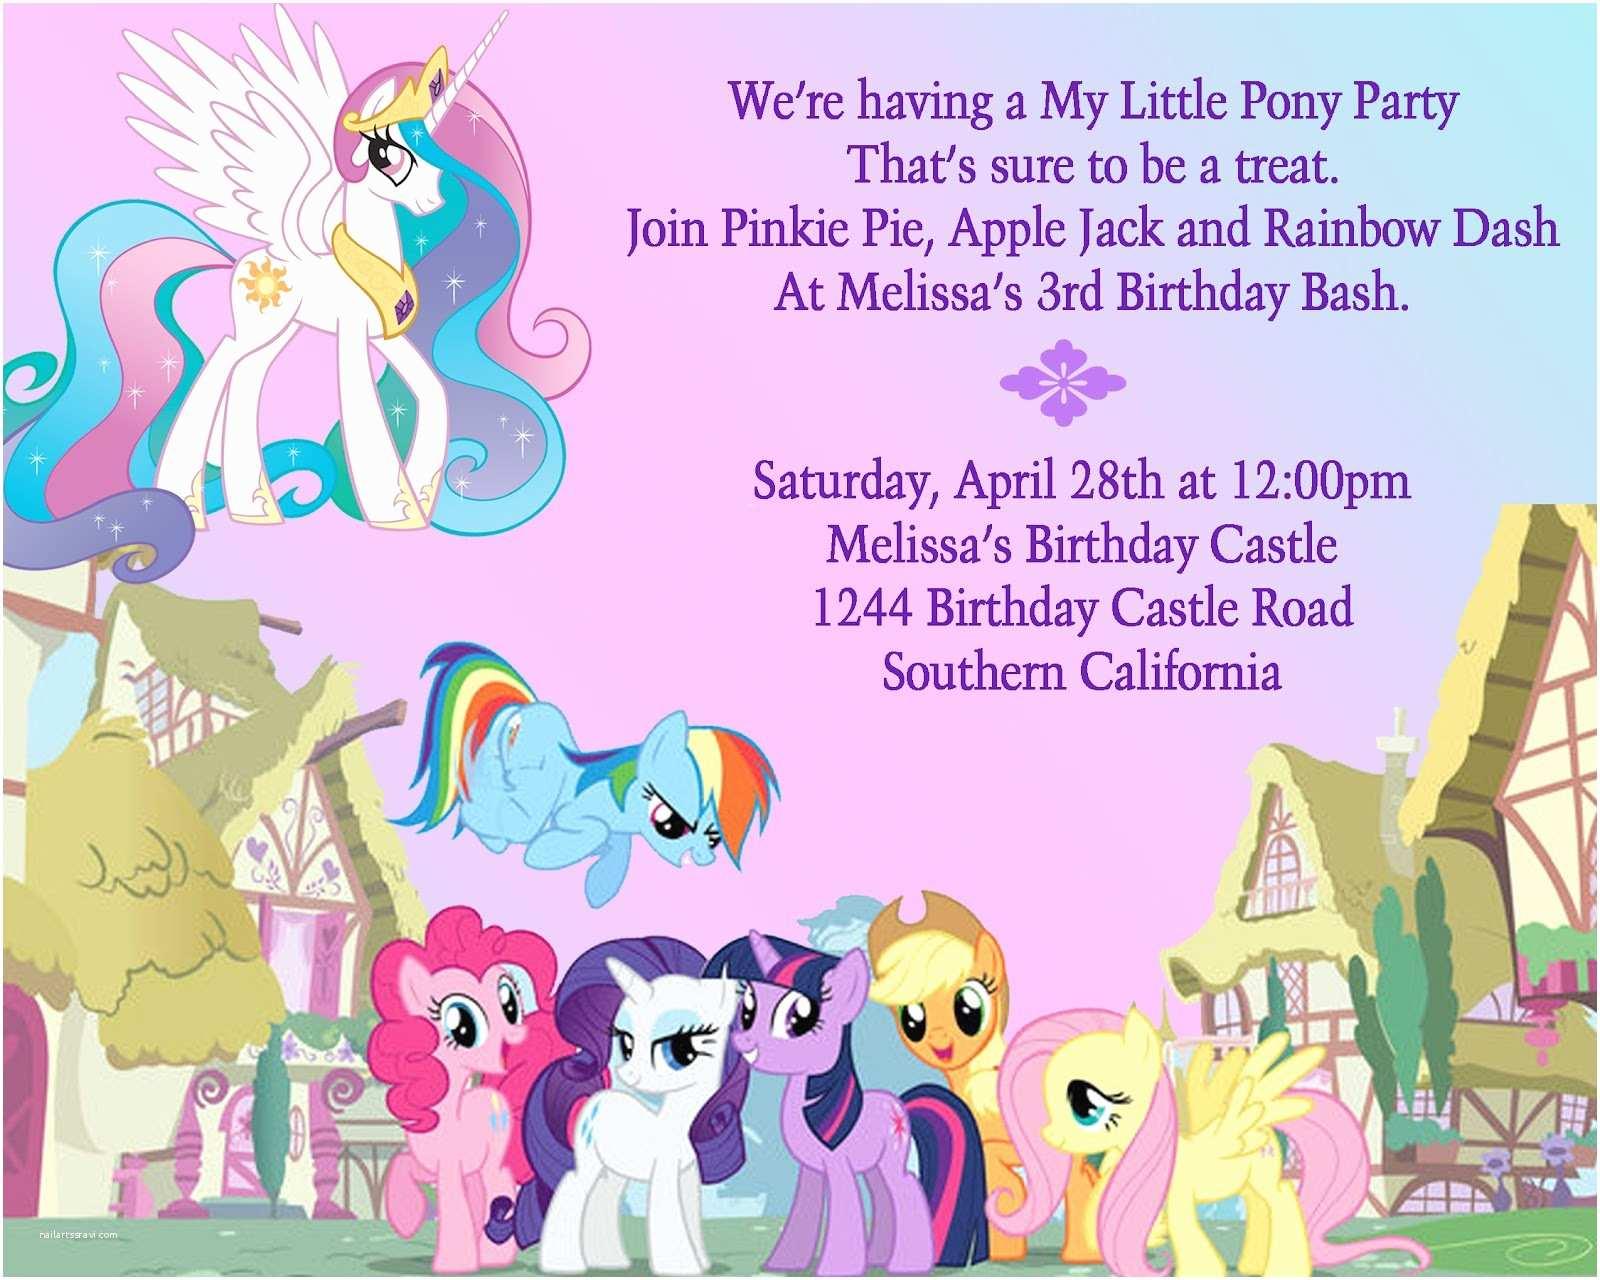 My Little Pony Party Invitations Birthday Party Ideas My Little Pony Birthday Party